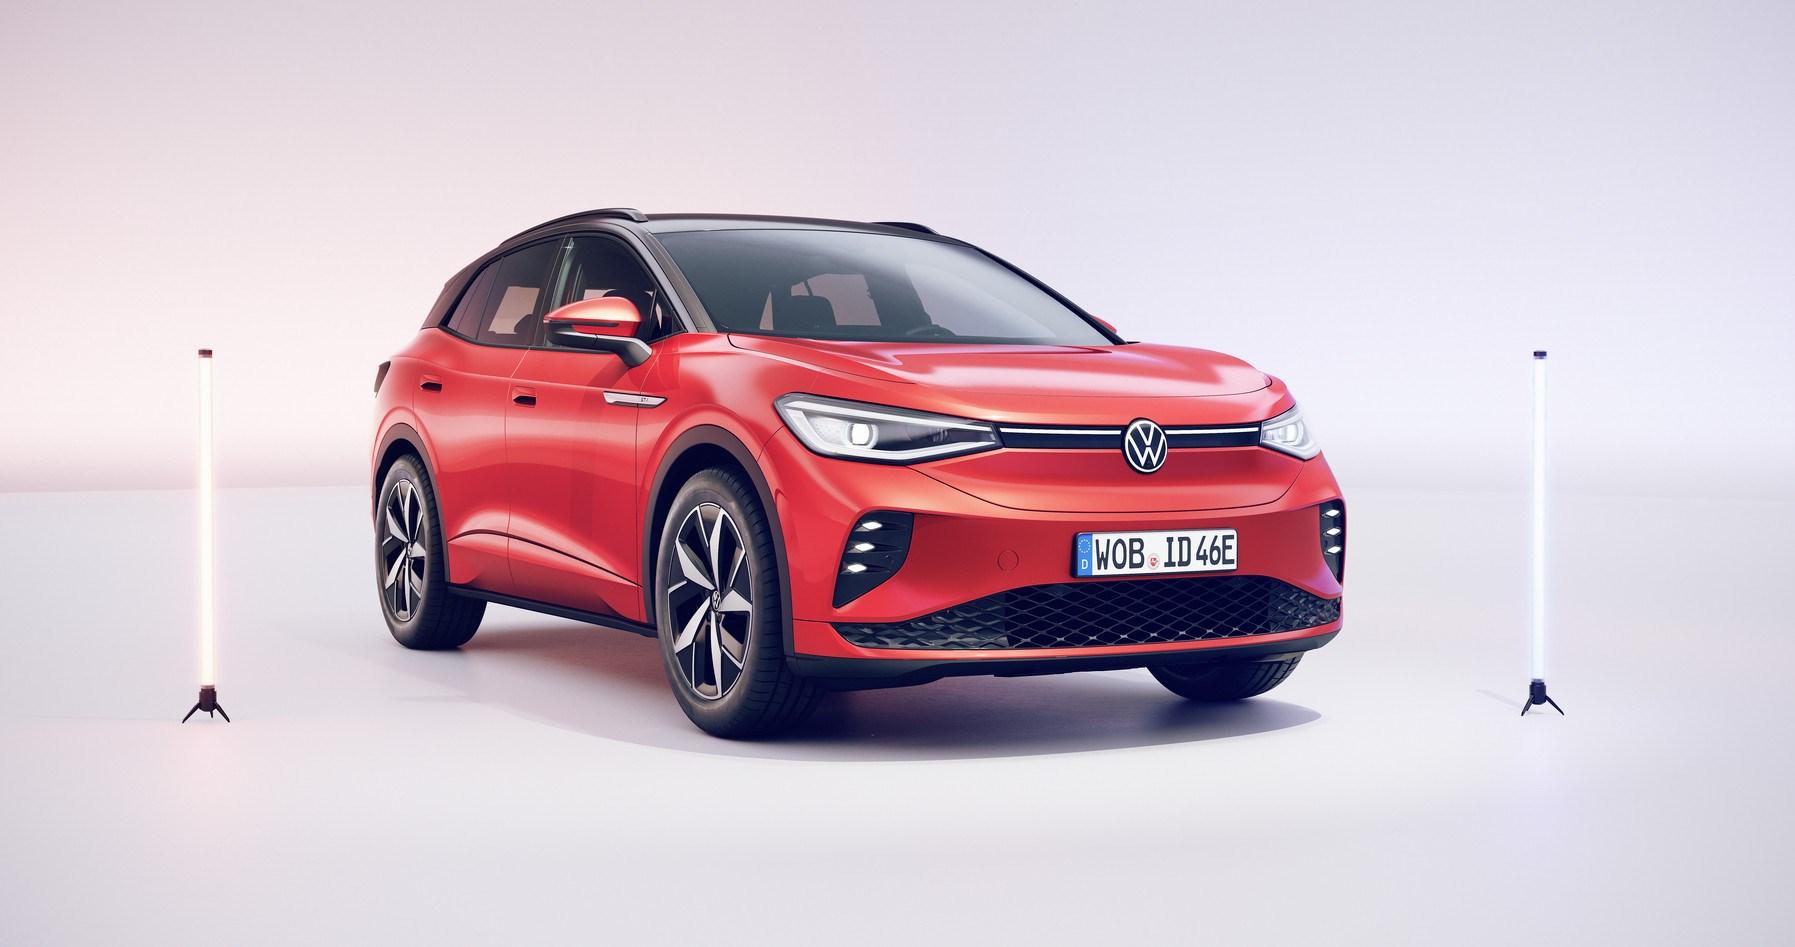 VWが電気自動車ID.シリーズ好調で自社製電池の生産力をアップ。2030年には欧州販売の7割をBEVに